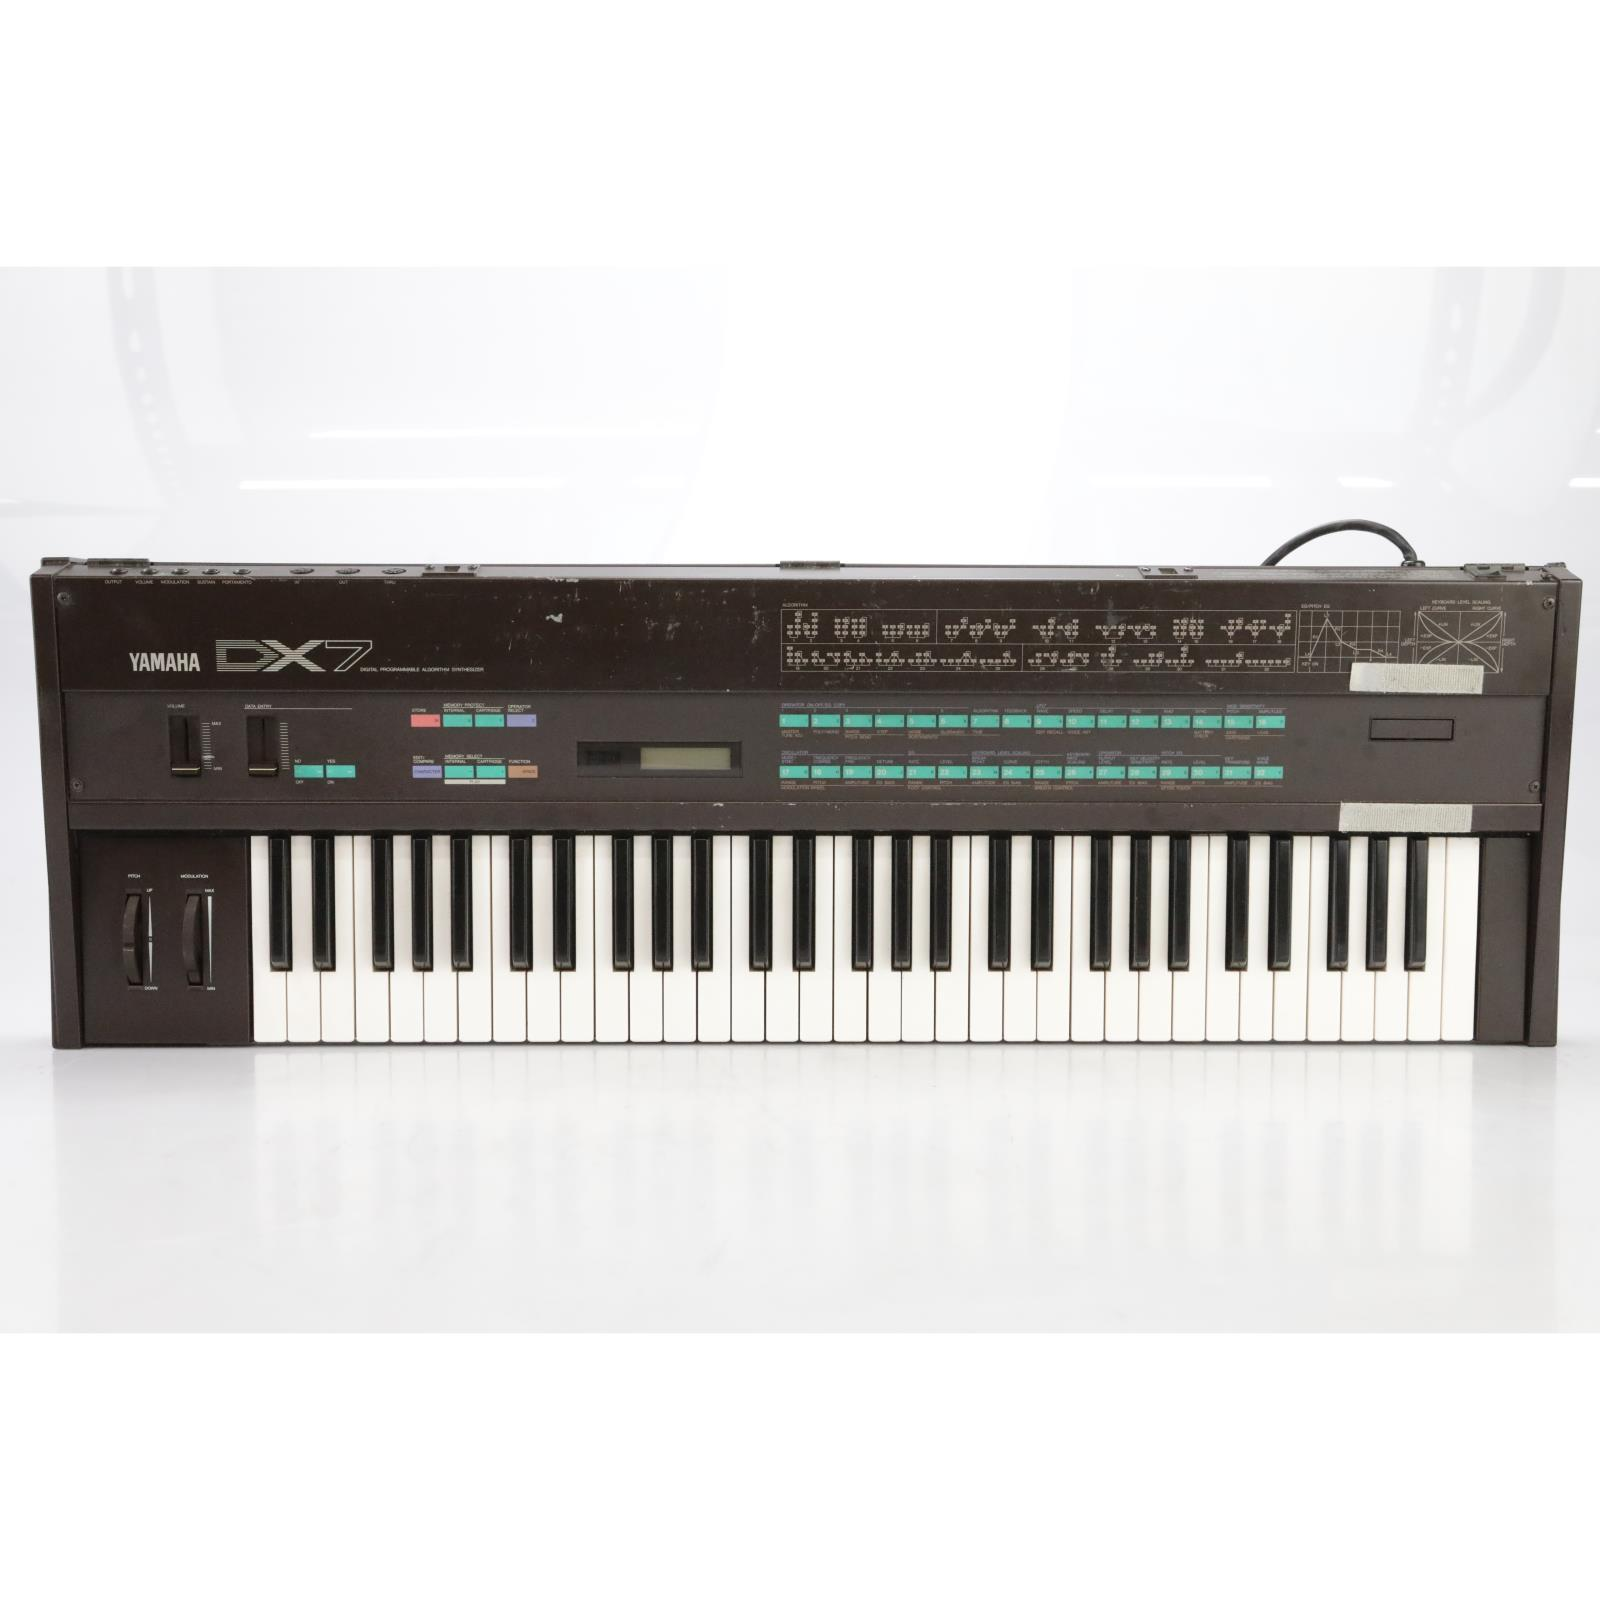 Yamaha DX7 61-Key Digital Synthesizer w/ ATS Case Owned By David Roback #44728